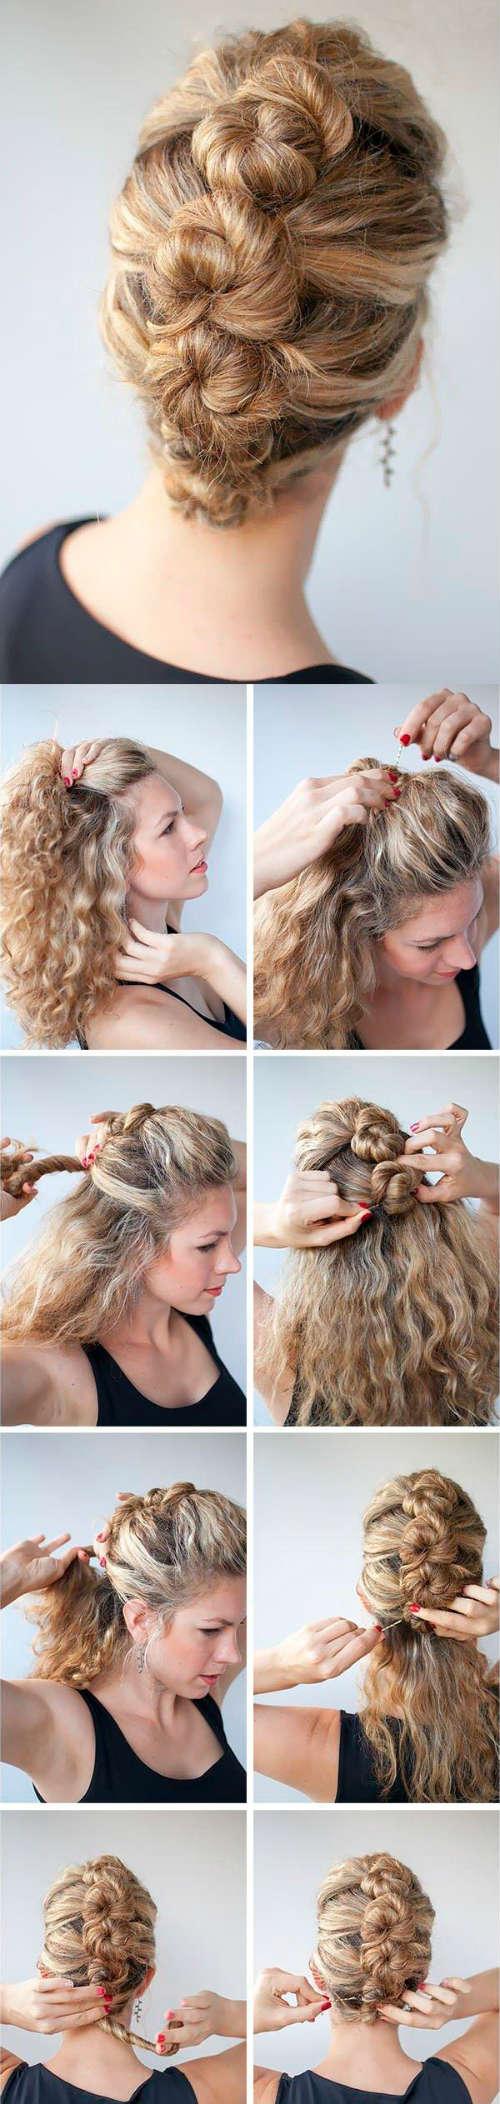 Festive easy hairstyles for medium length hair